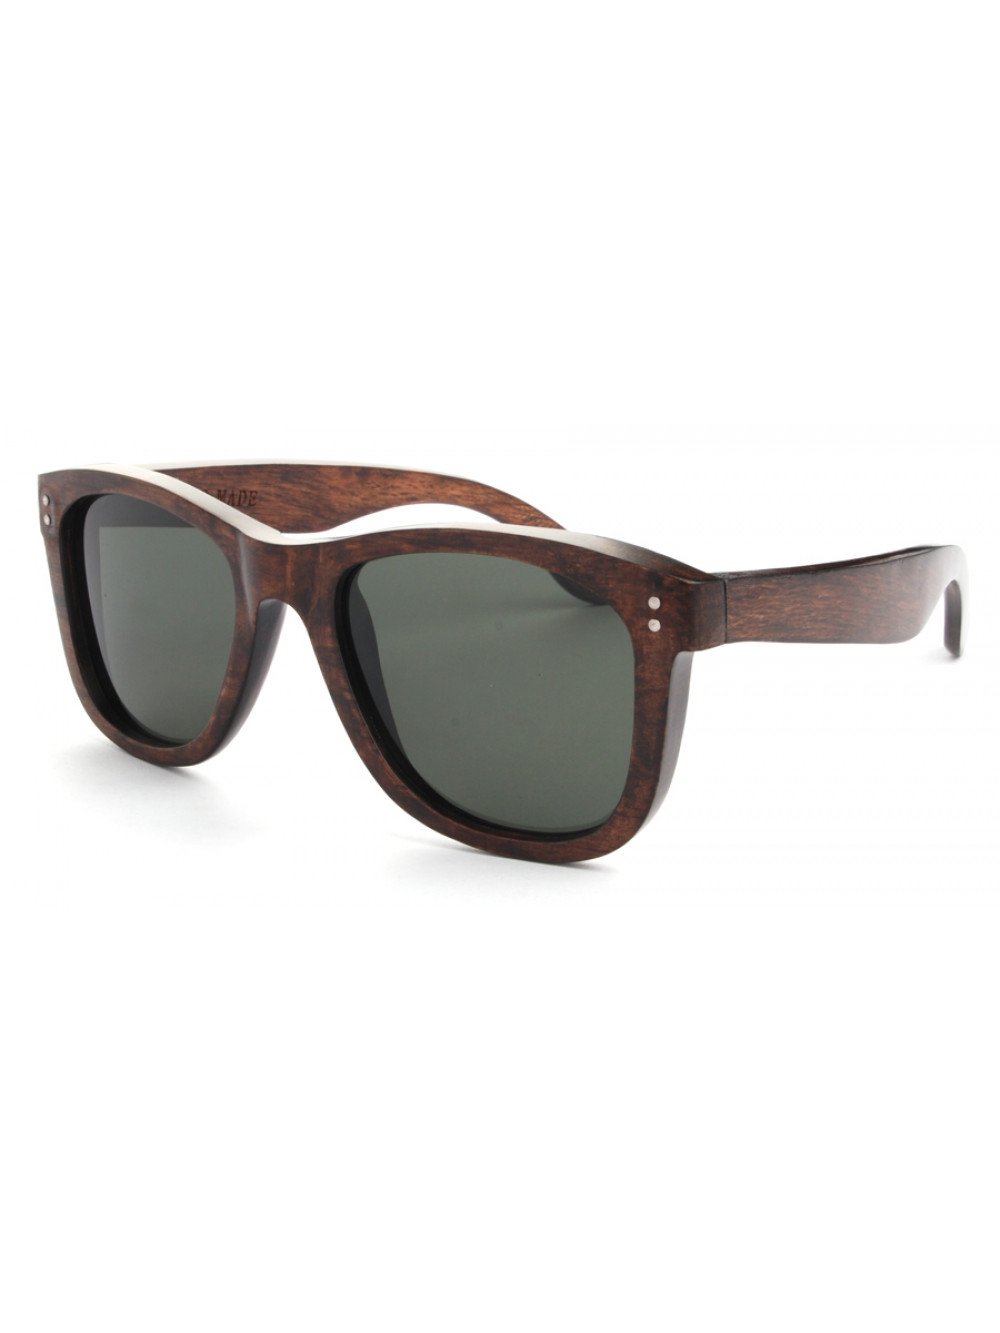 Drevené slnečné okuliare Elite Dark Wood